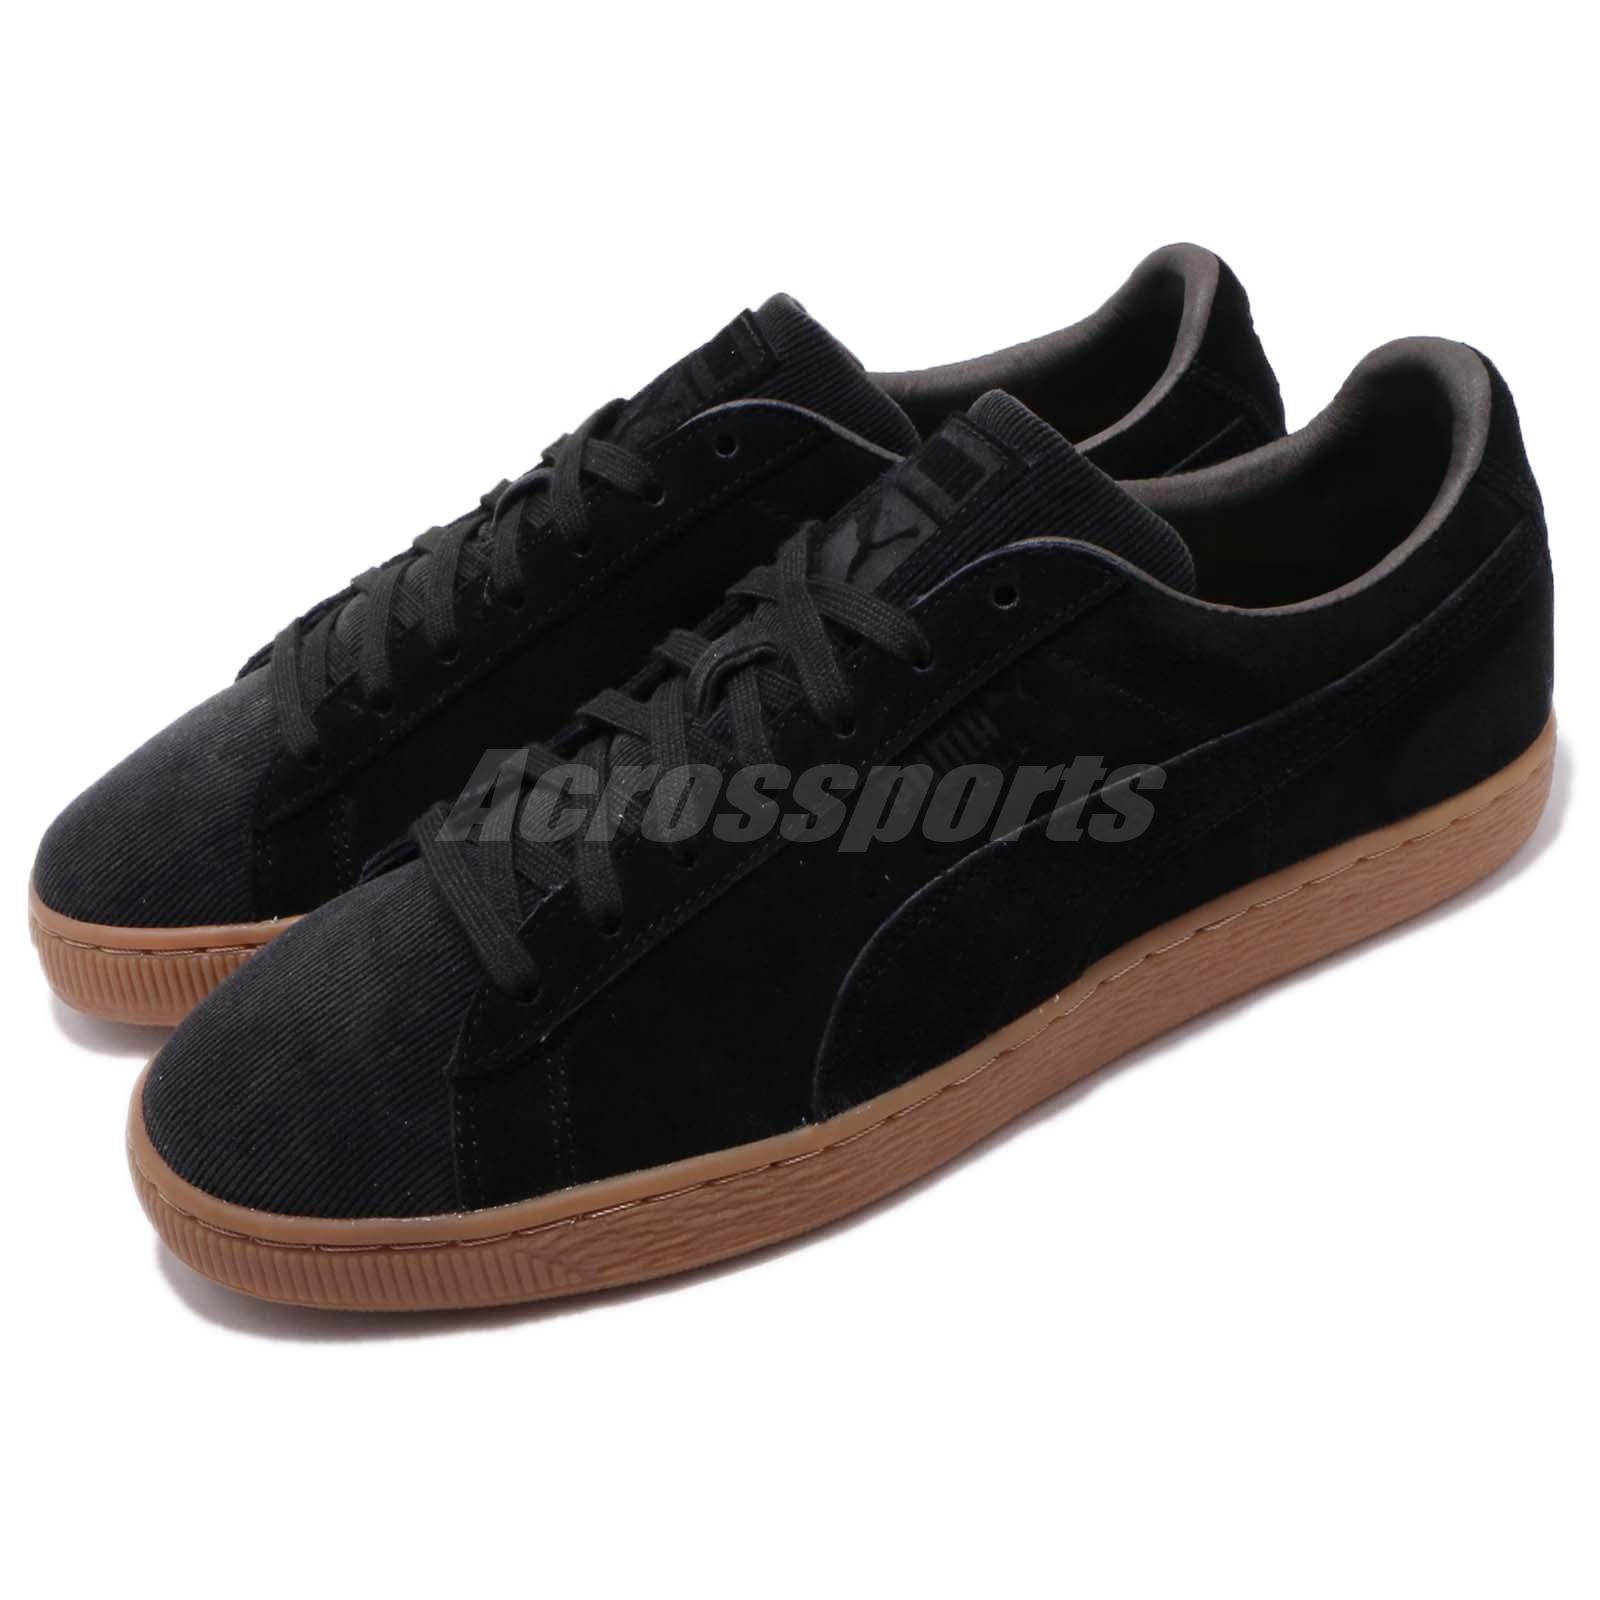 Details about Puma Suede Classic Pincord Black Gum Men Women Casual Shoes Sneakers 366235 01